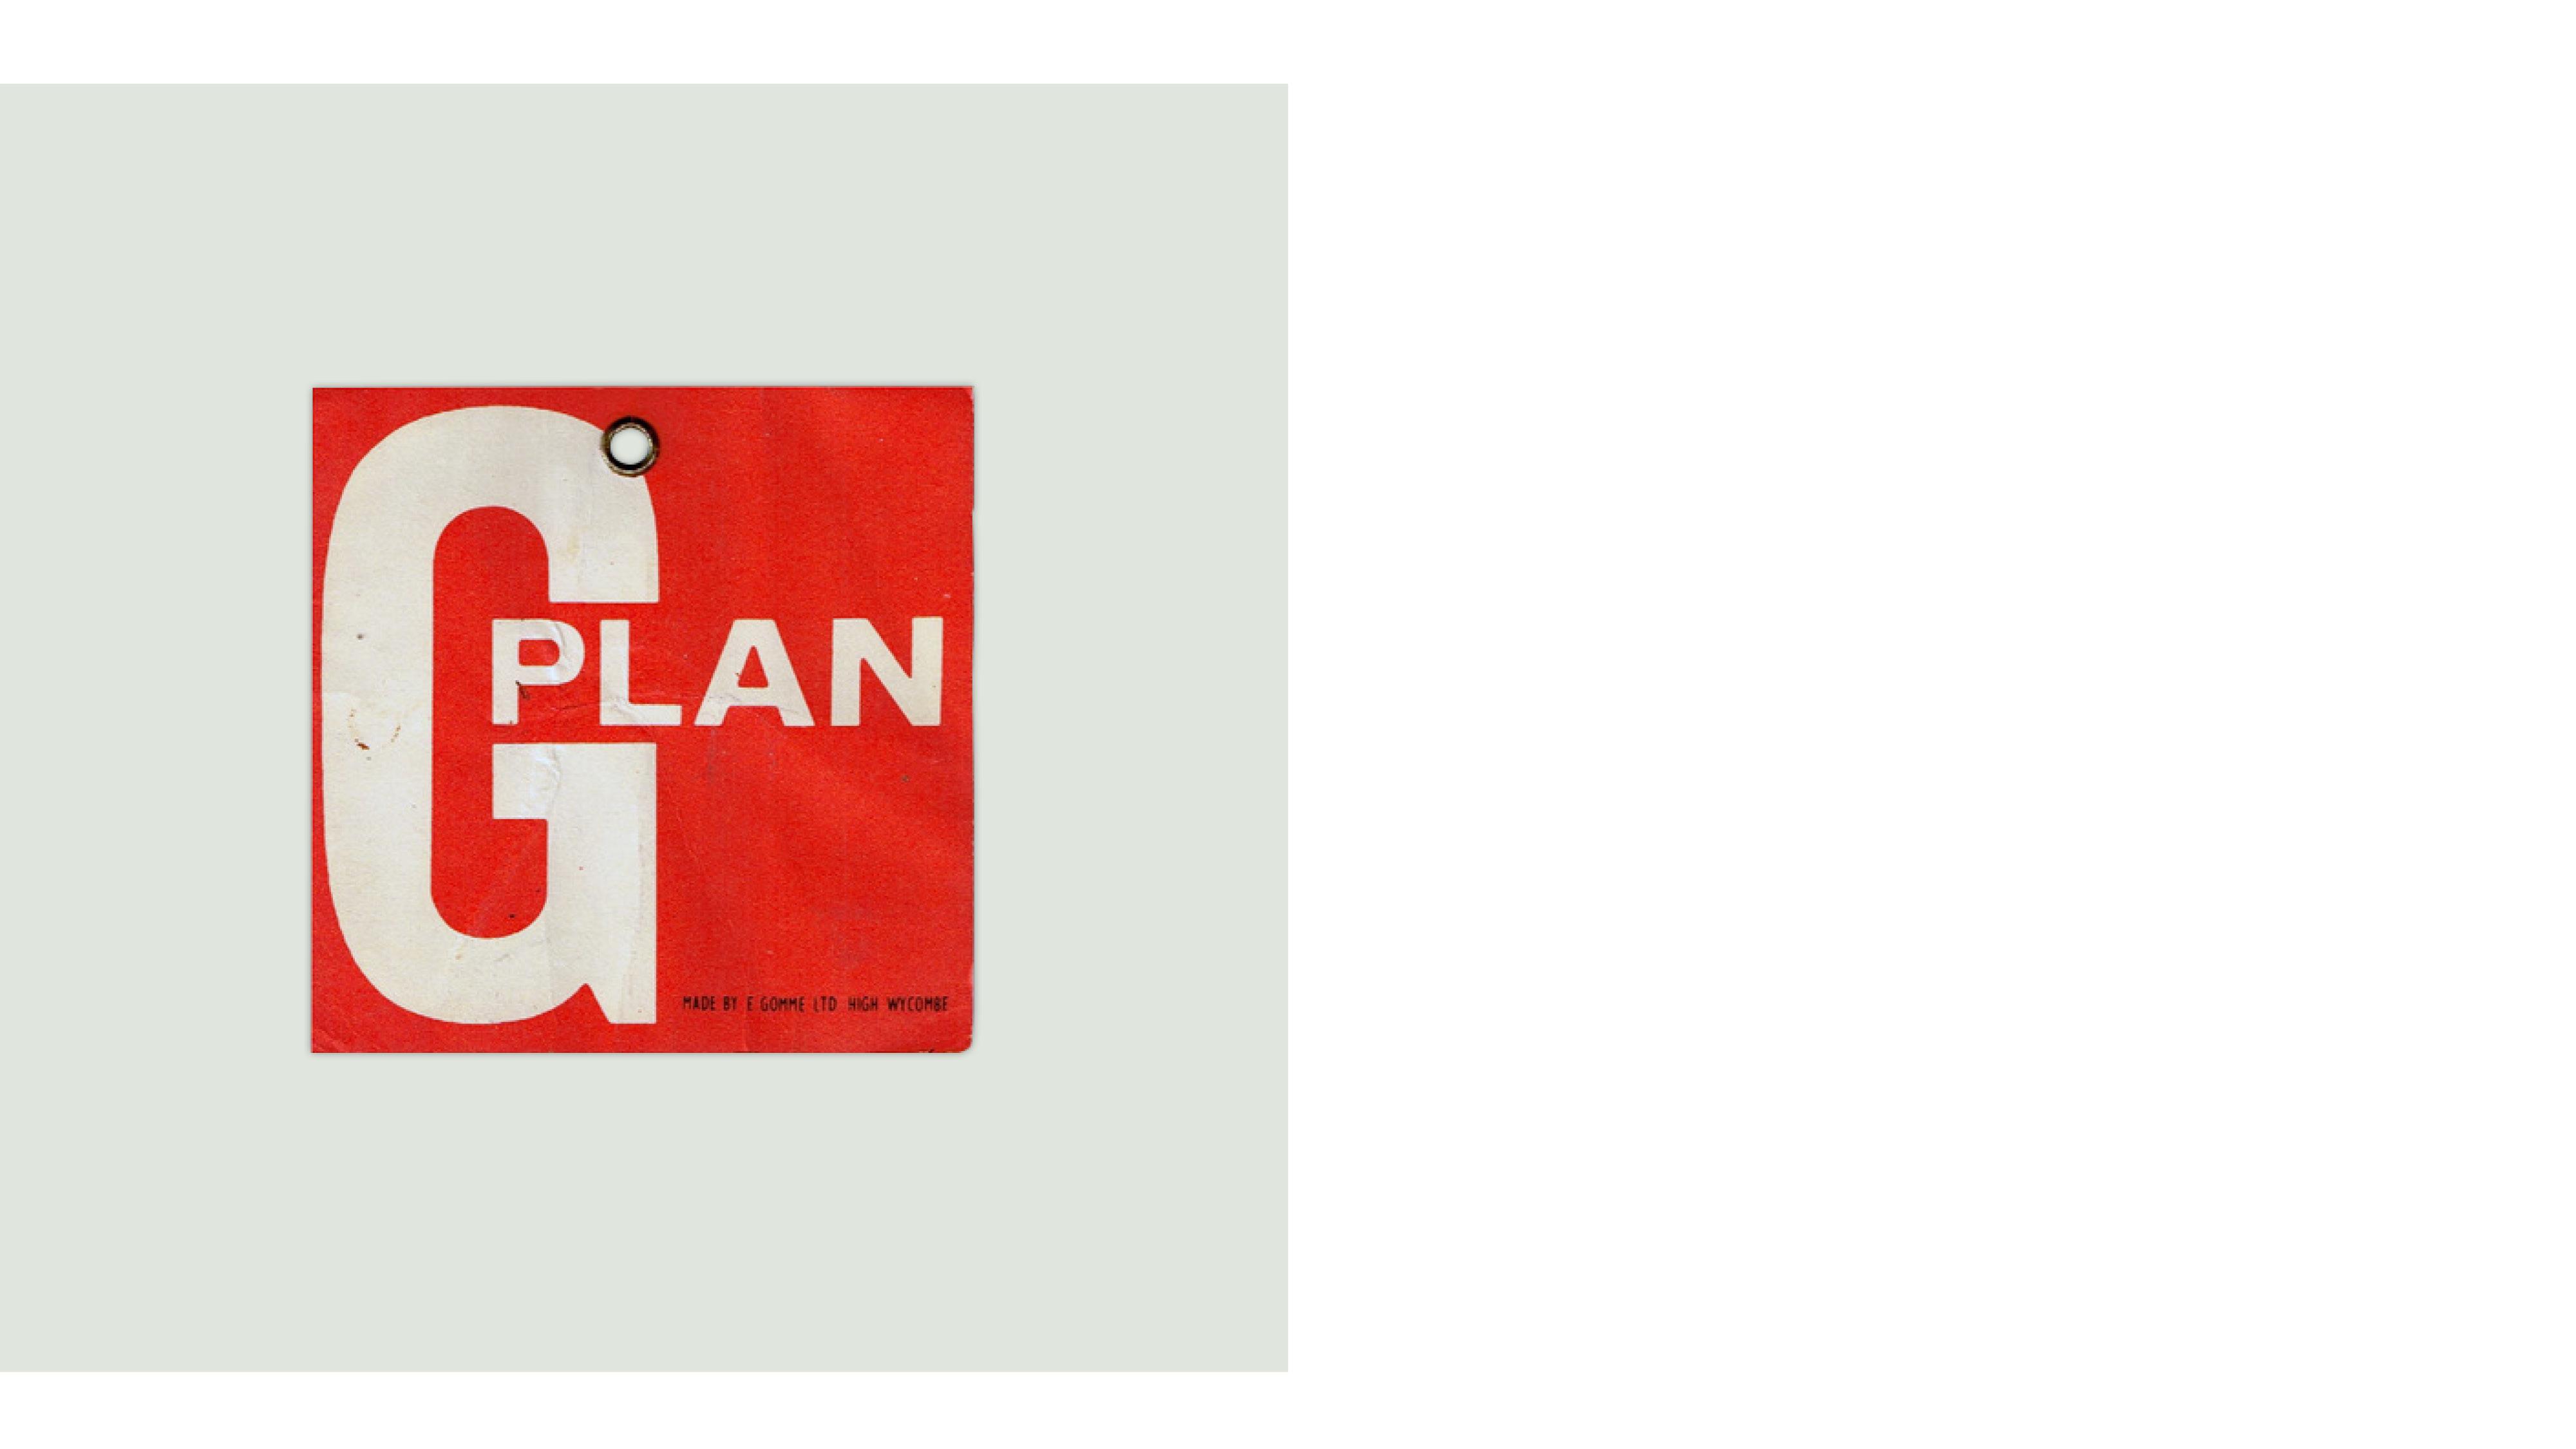 G Plan brand positioning